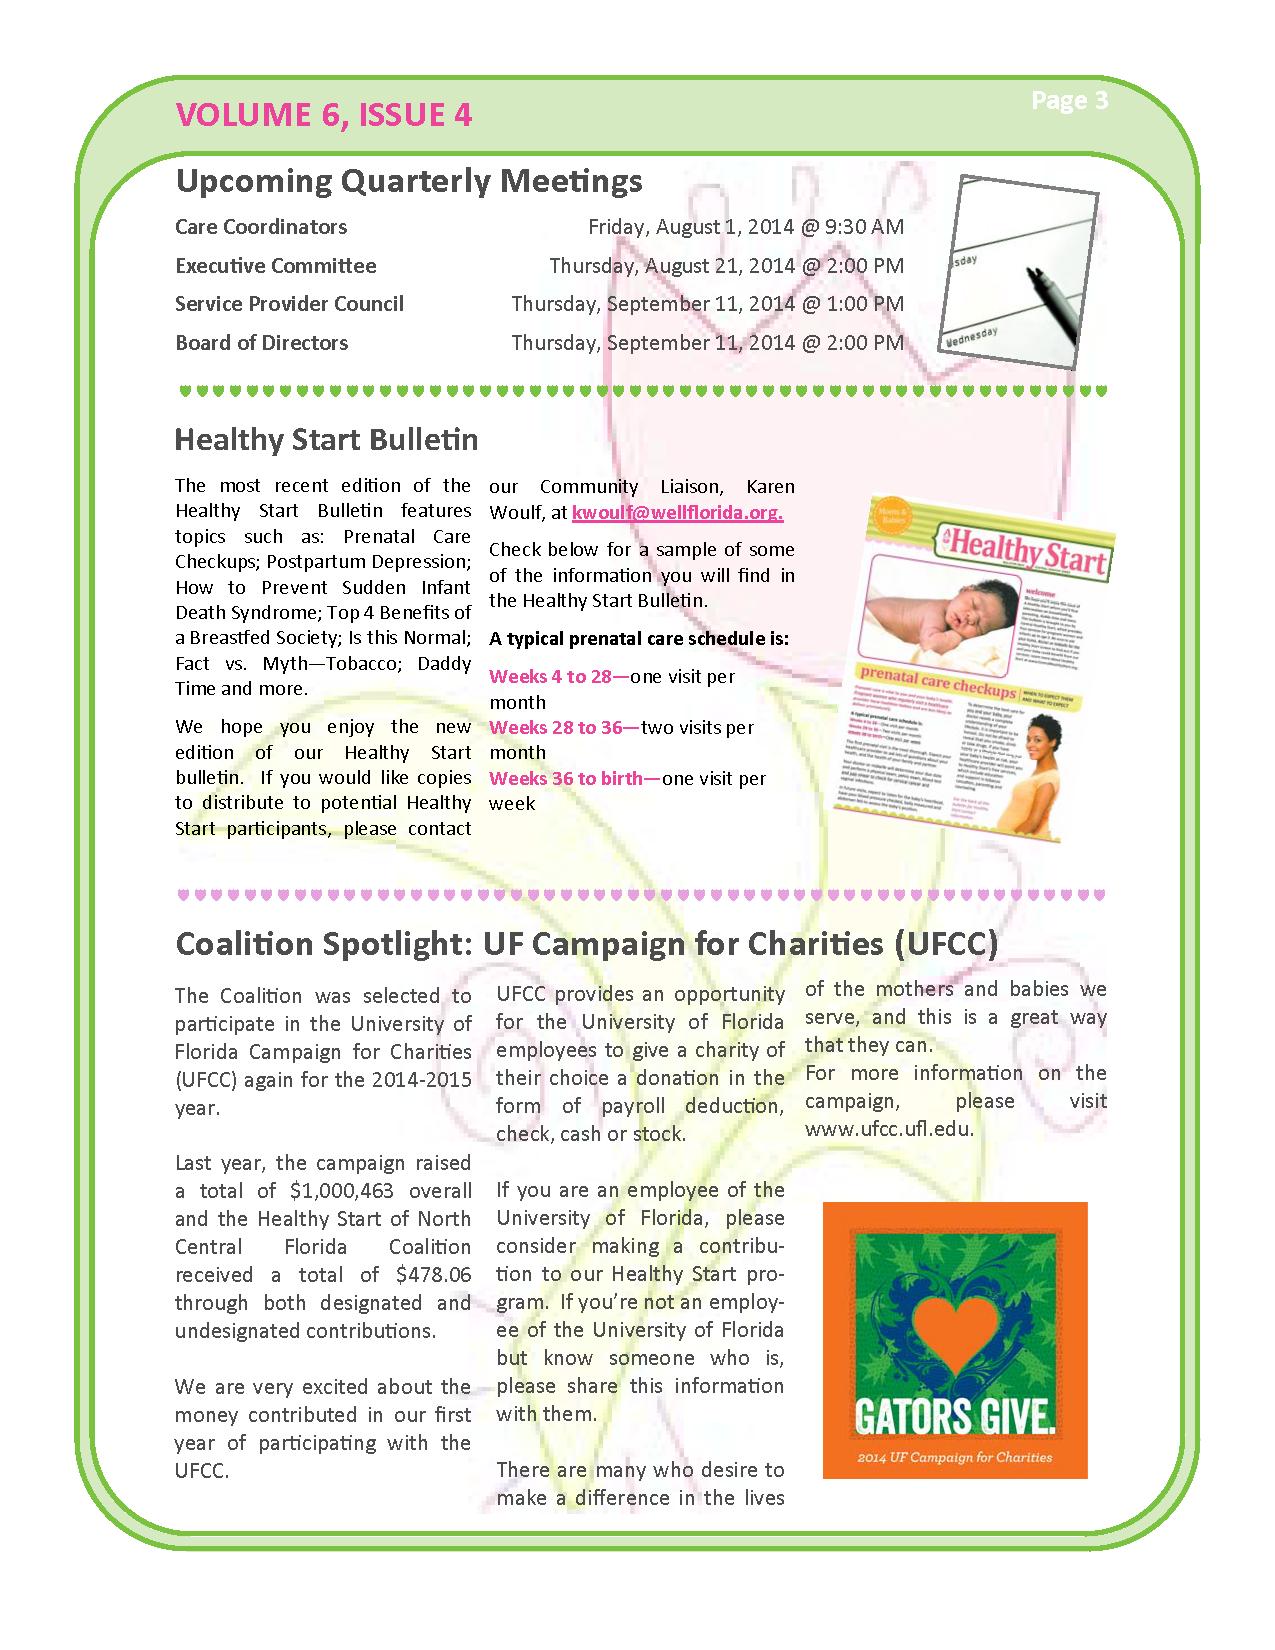 Please Come Visit Us At Healthystartncf Healthy